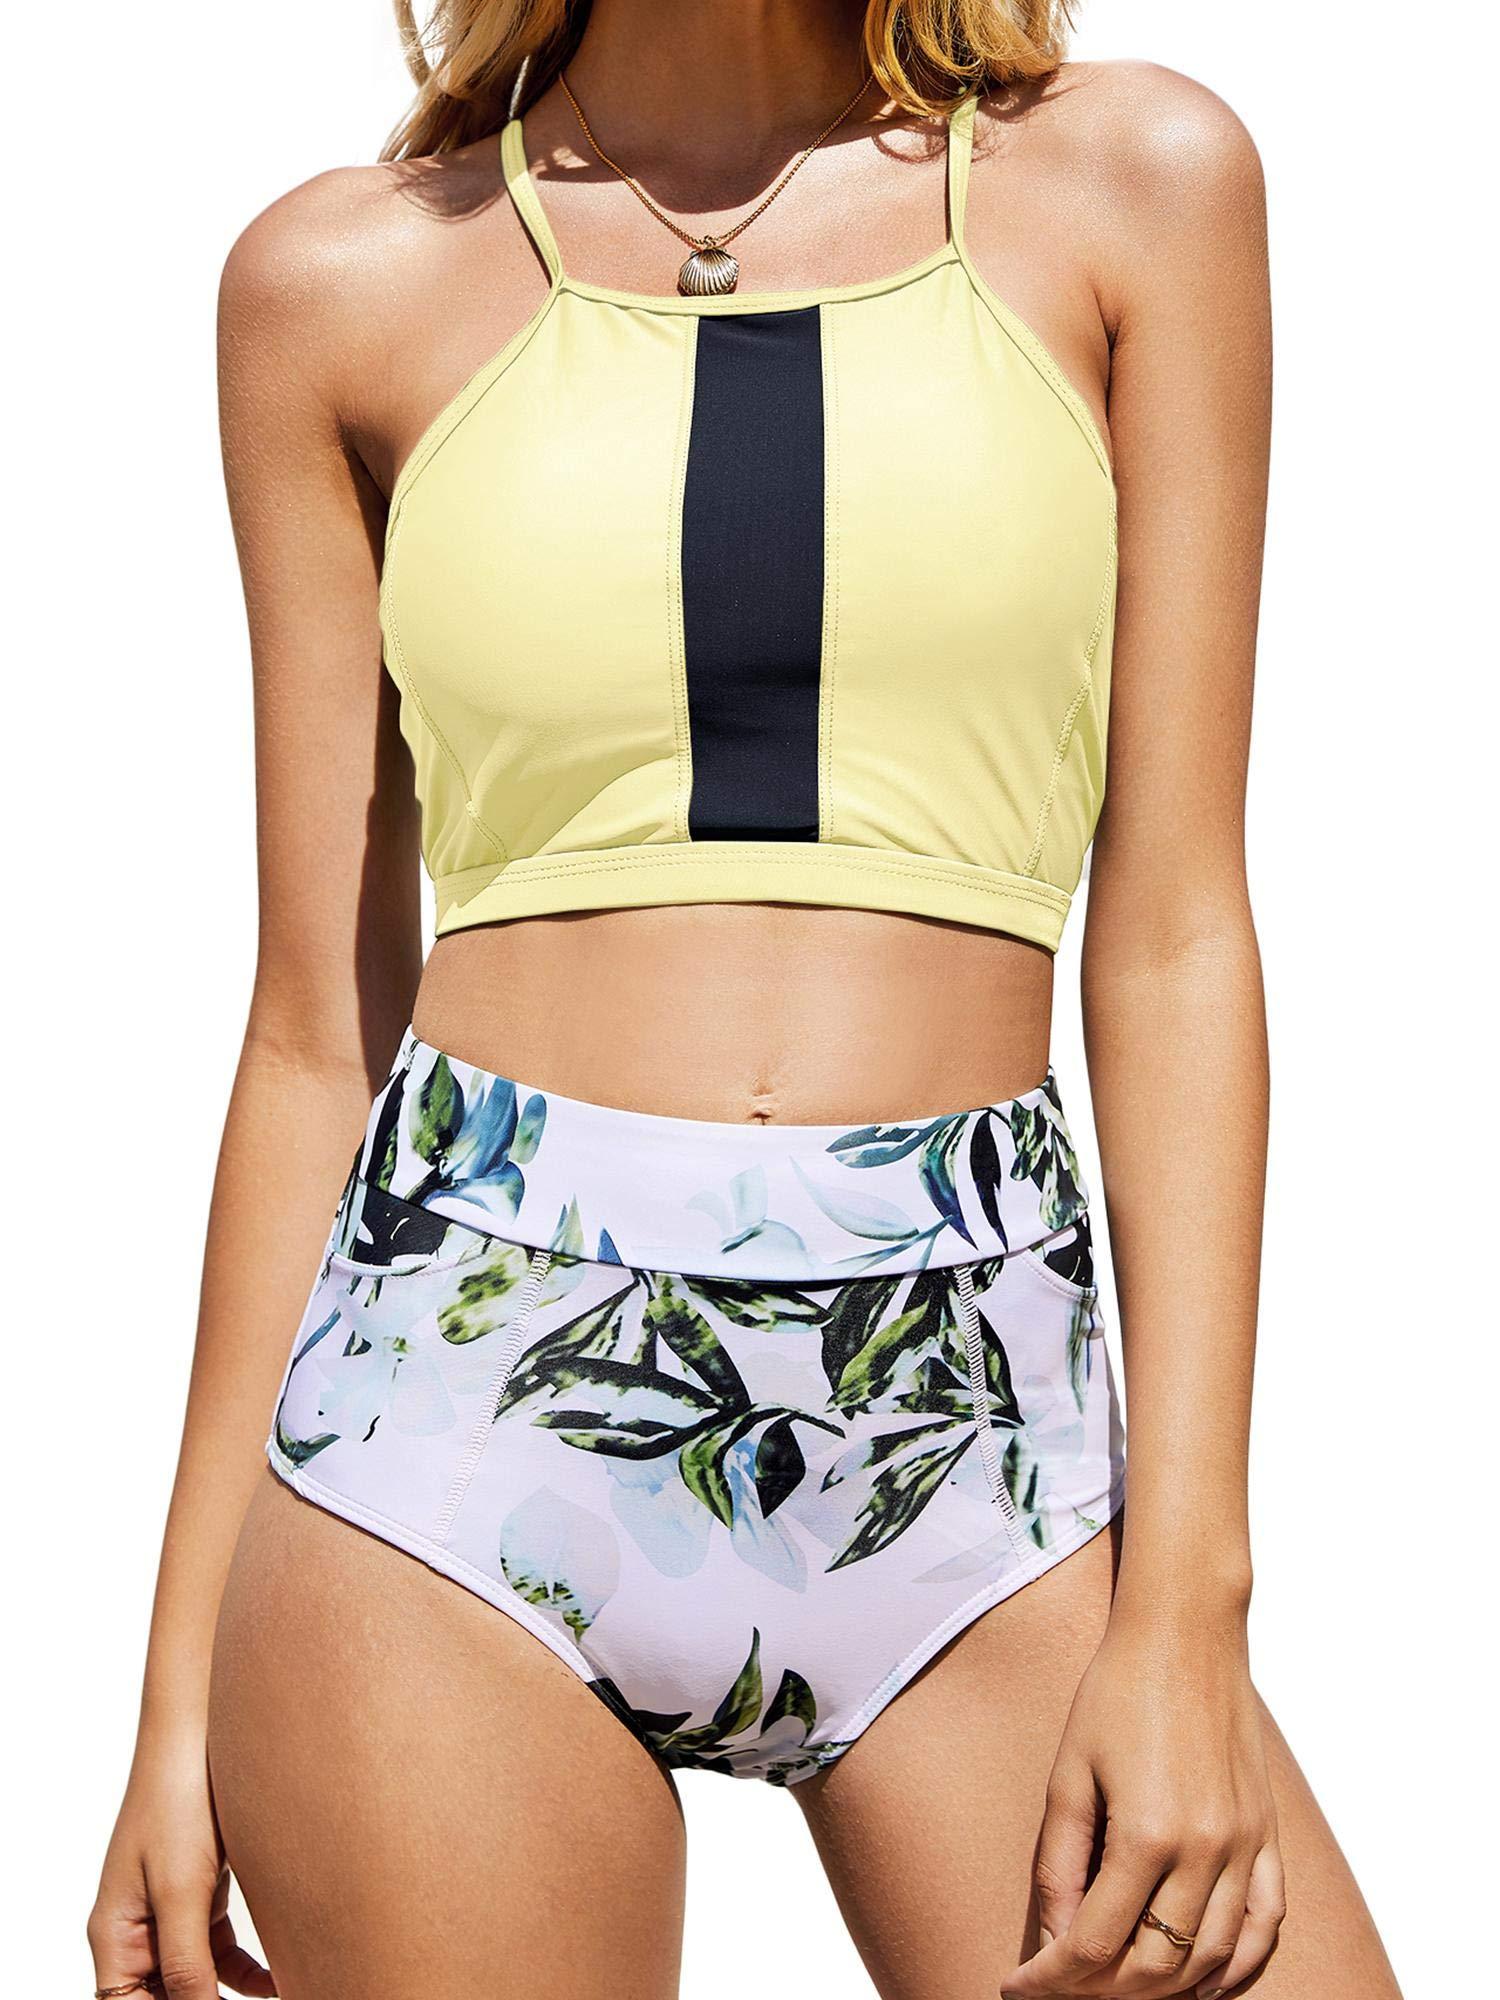 Tutorutor Womens High Waisted Swimsuits Halter Bikini Set Summer Two Piece Retro Criss Cross Leaf Print Beach Swimwear